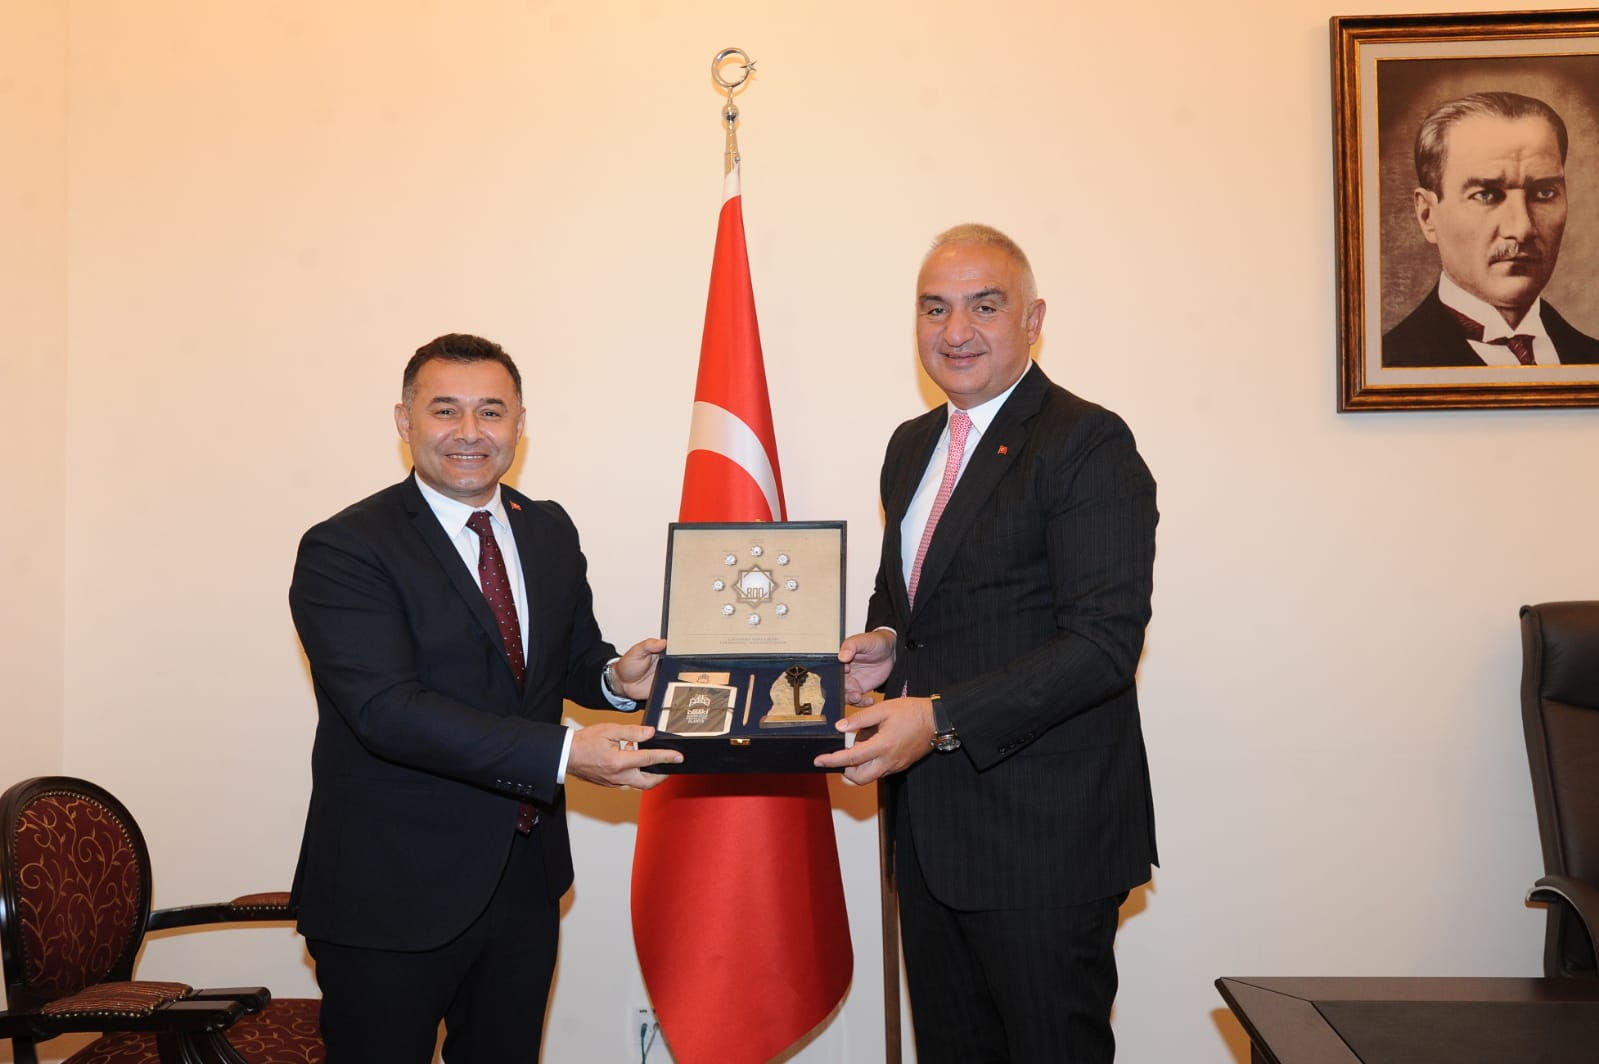 Başkan Yücel'in Yoğun Ankara Mesaisi